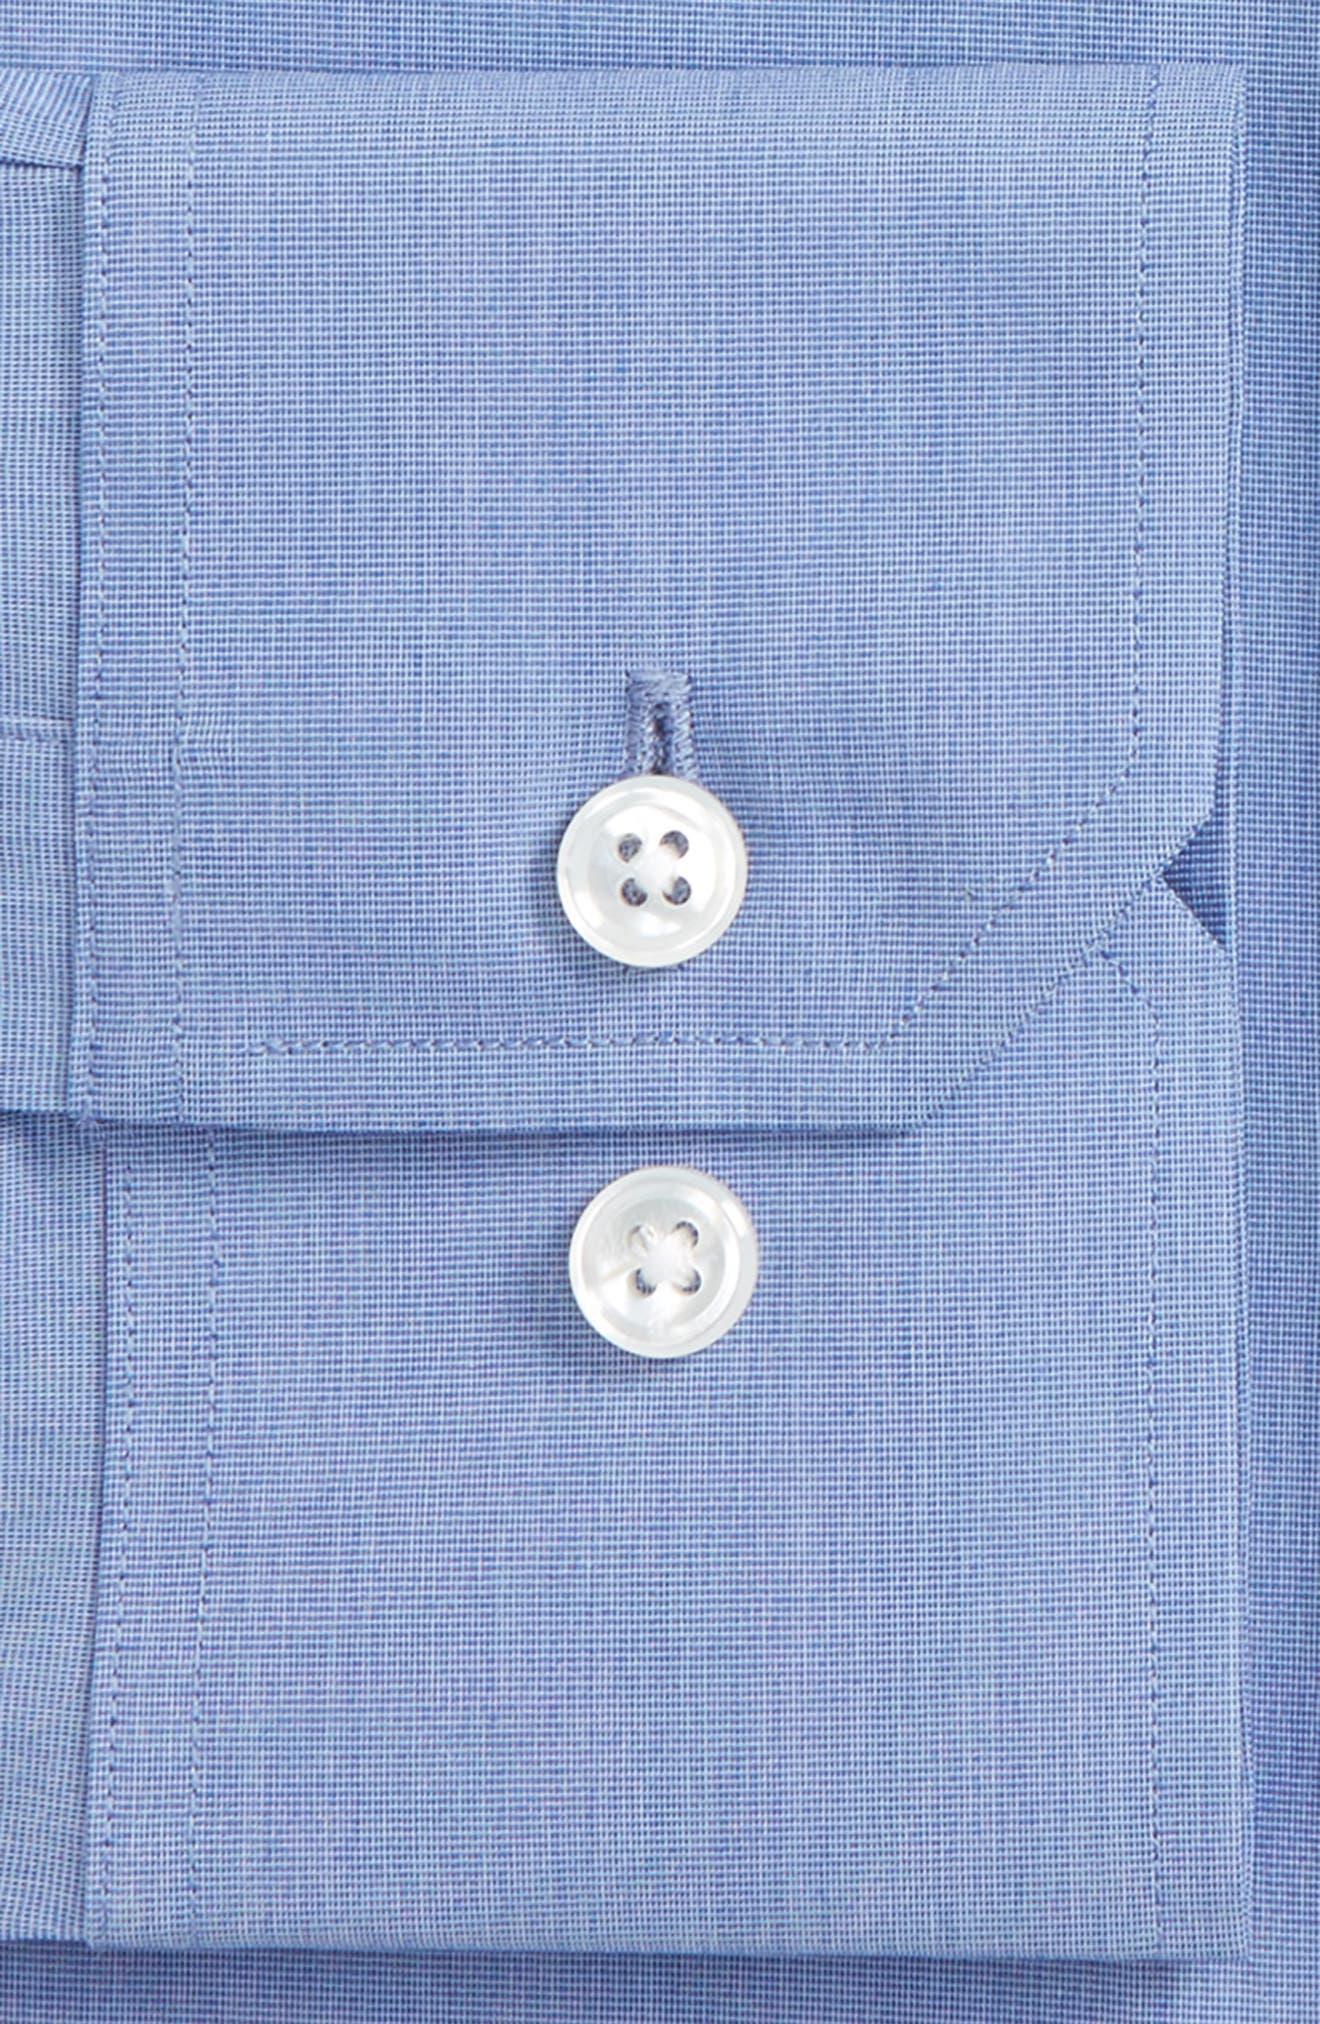 Jetsetter Slim Fit Solid Dress Shirt,                             Main thumbnail 1, color,                             400